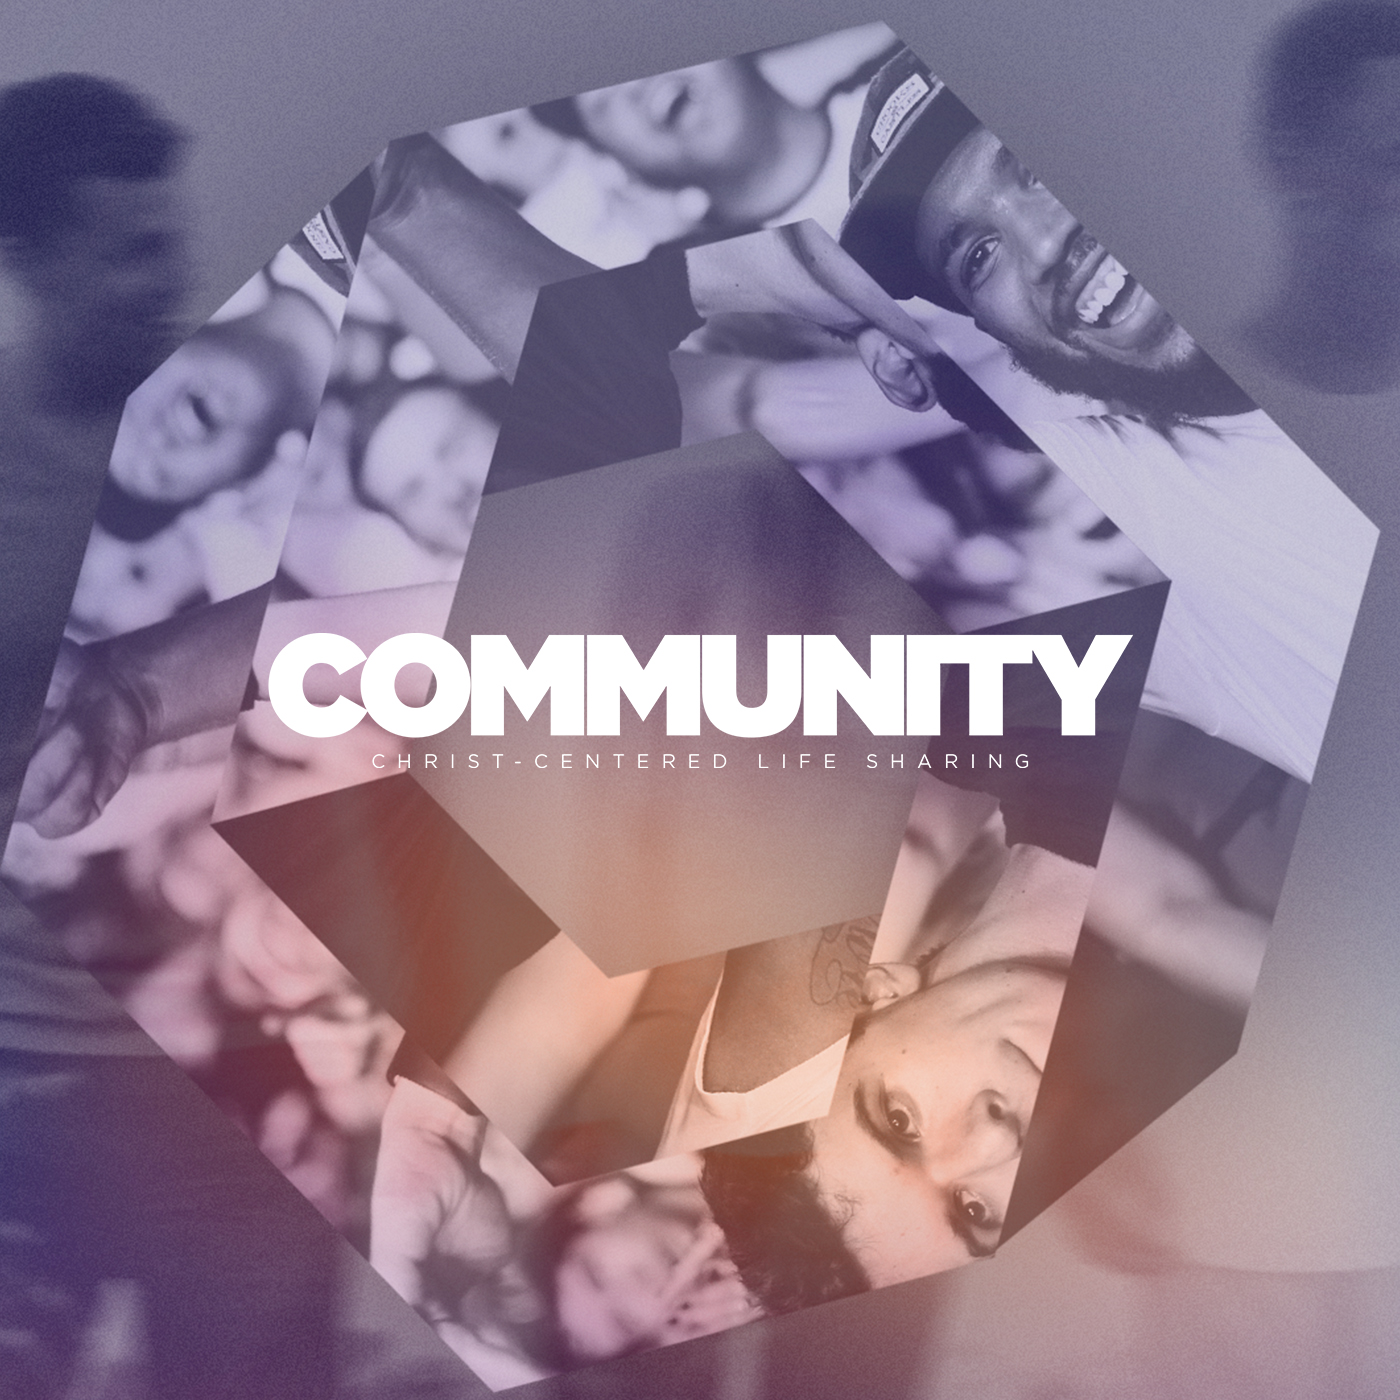 Community Square Image.jpg